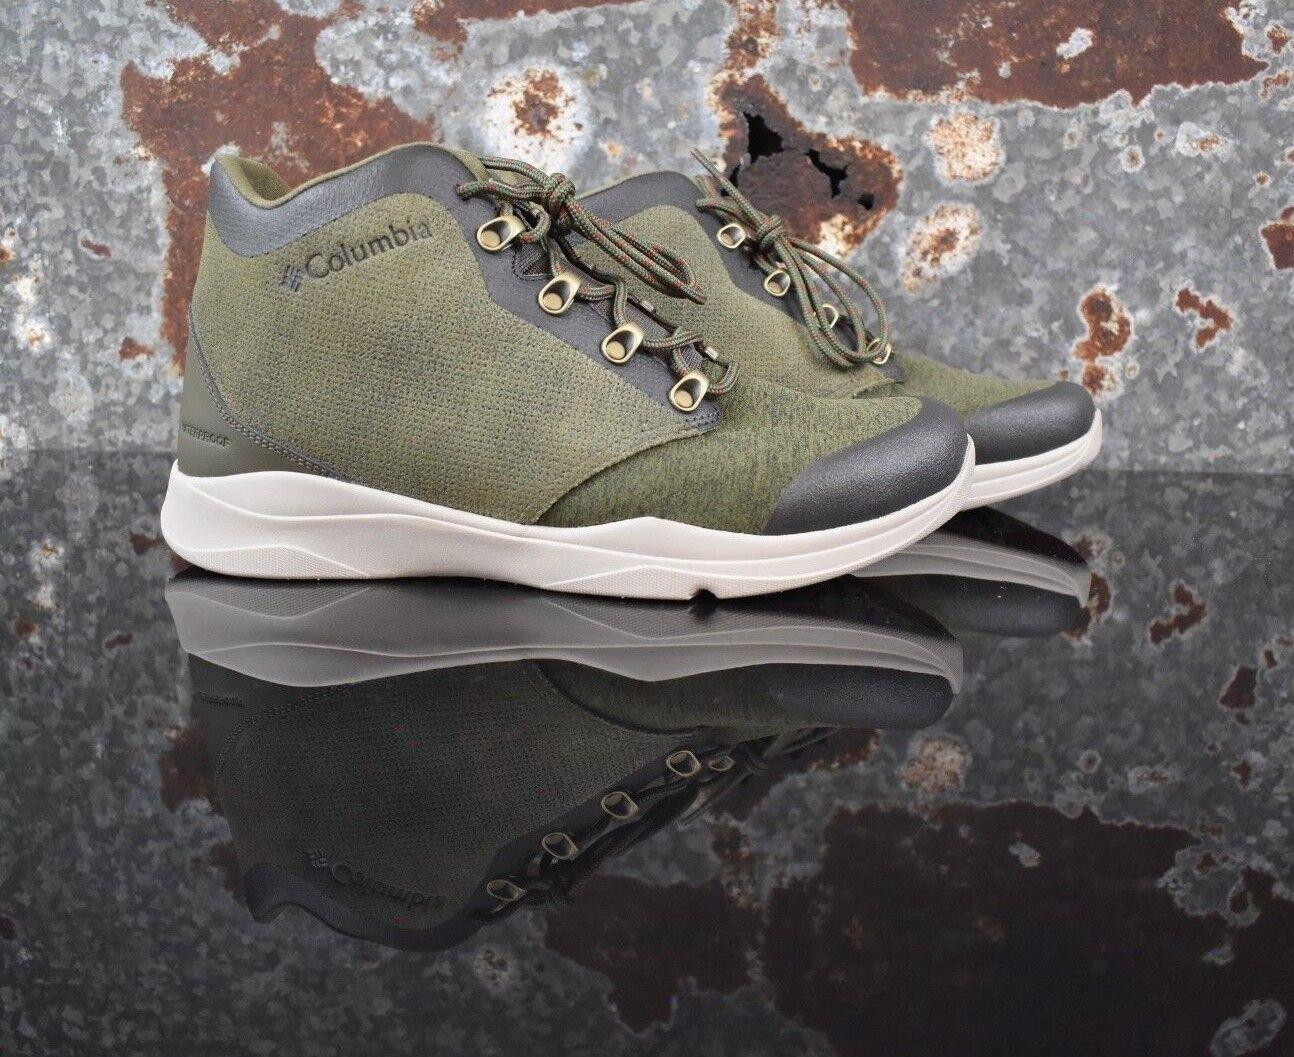 Columbia men's 17 Fall / Winter men's midsole Walker boots BM2874-383